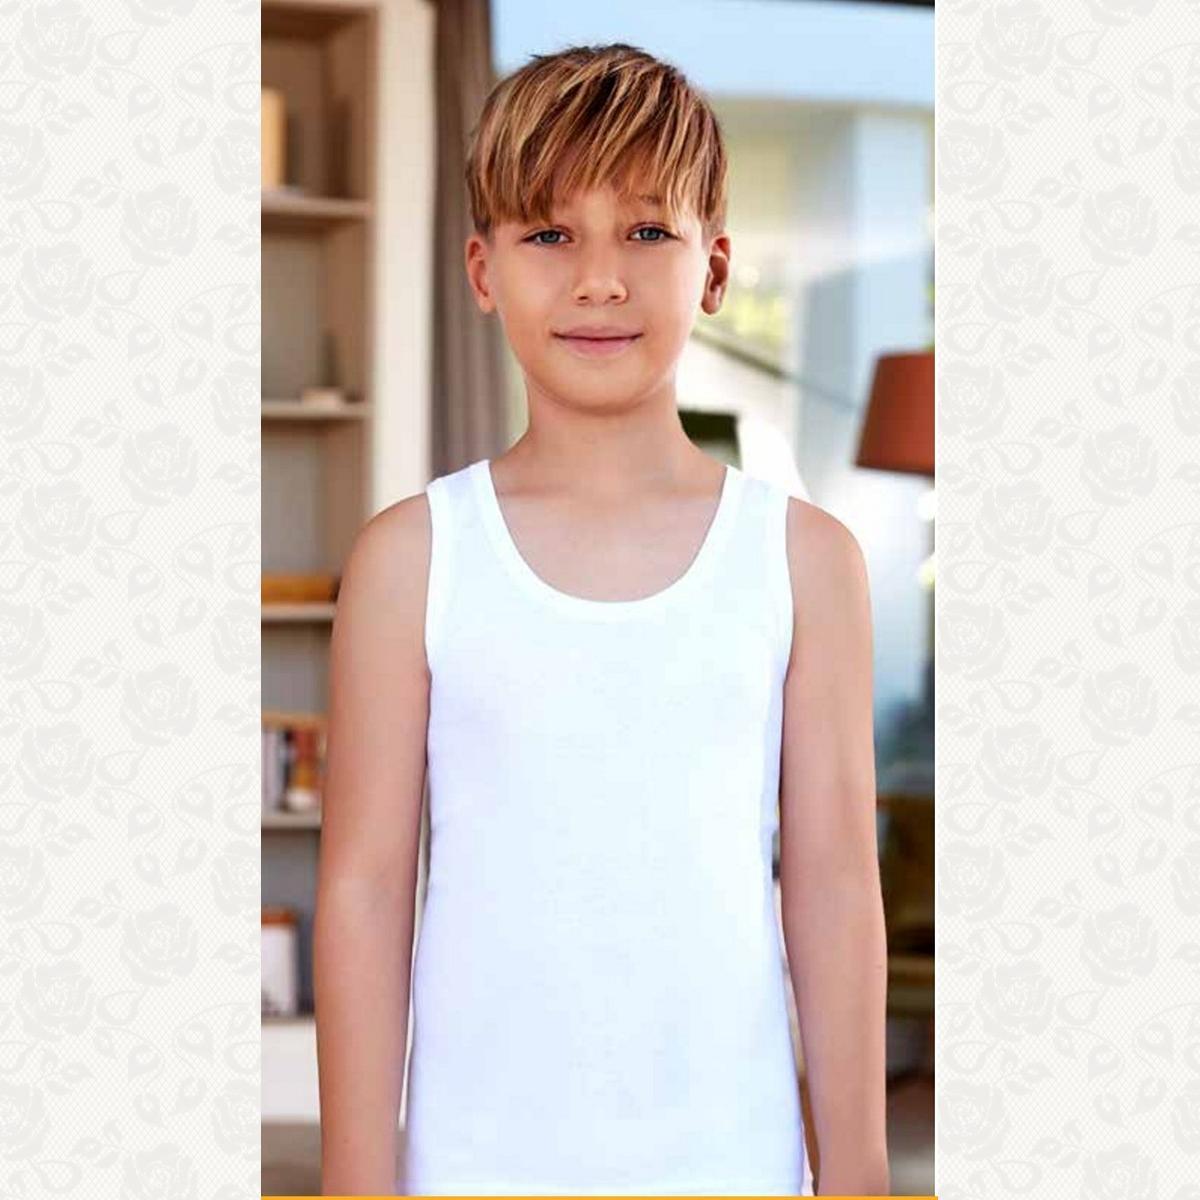 Майка для мальчика размер от 7 до 8, цвет белый, 6 шт.